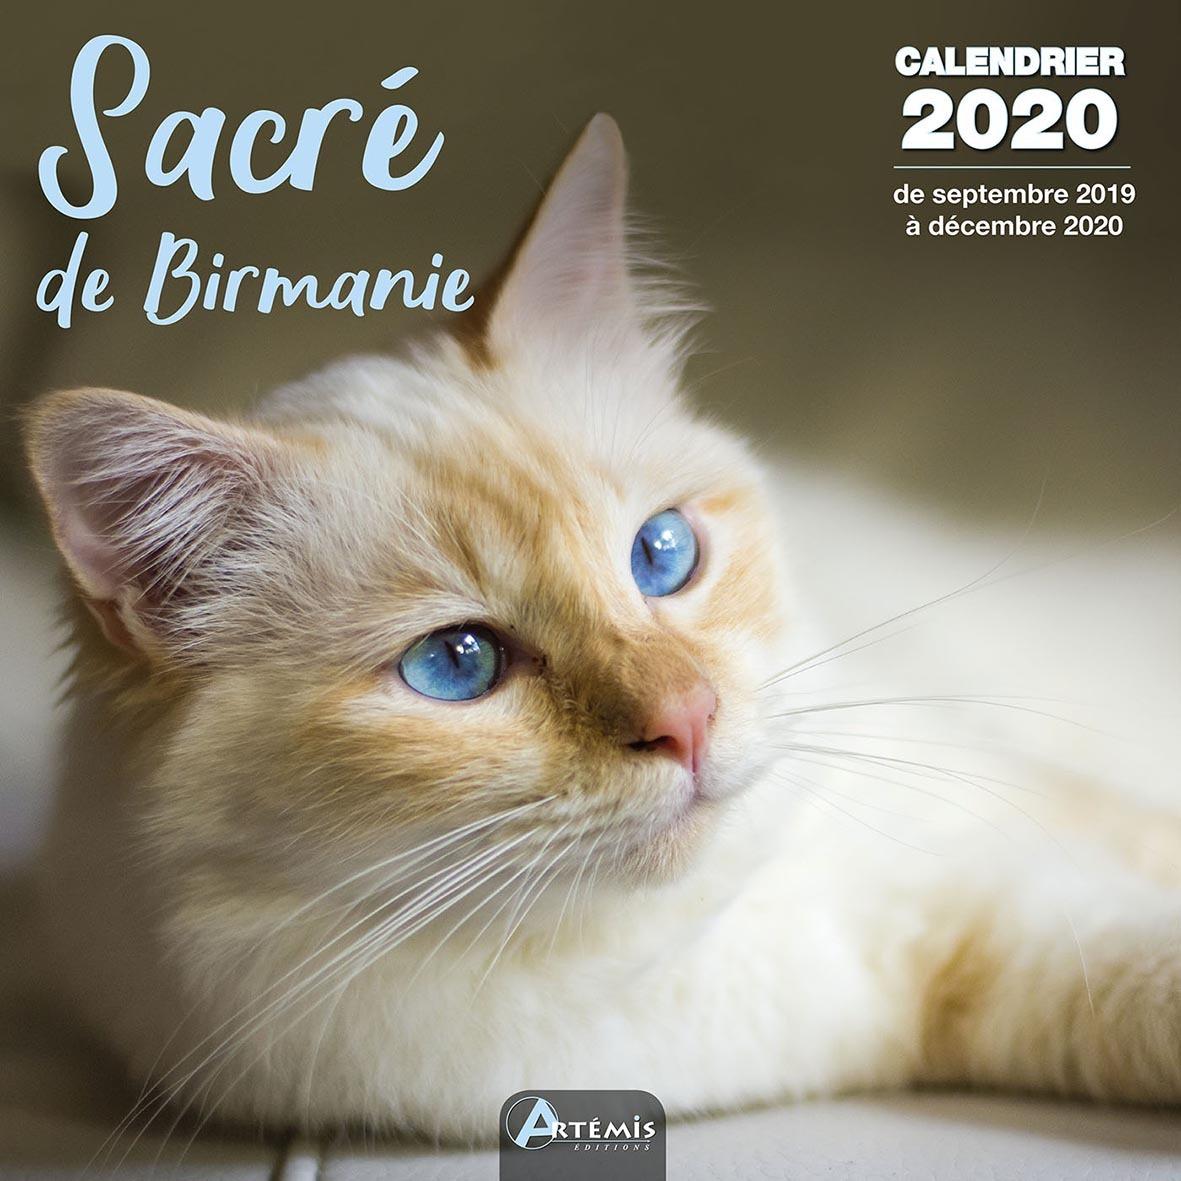 CALENDRIER SACRE DE BIRMANIE (2020)